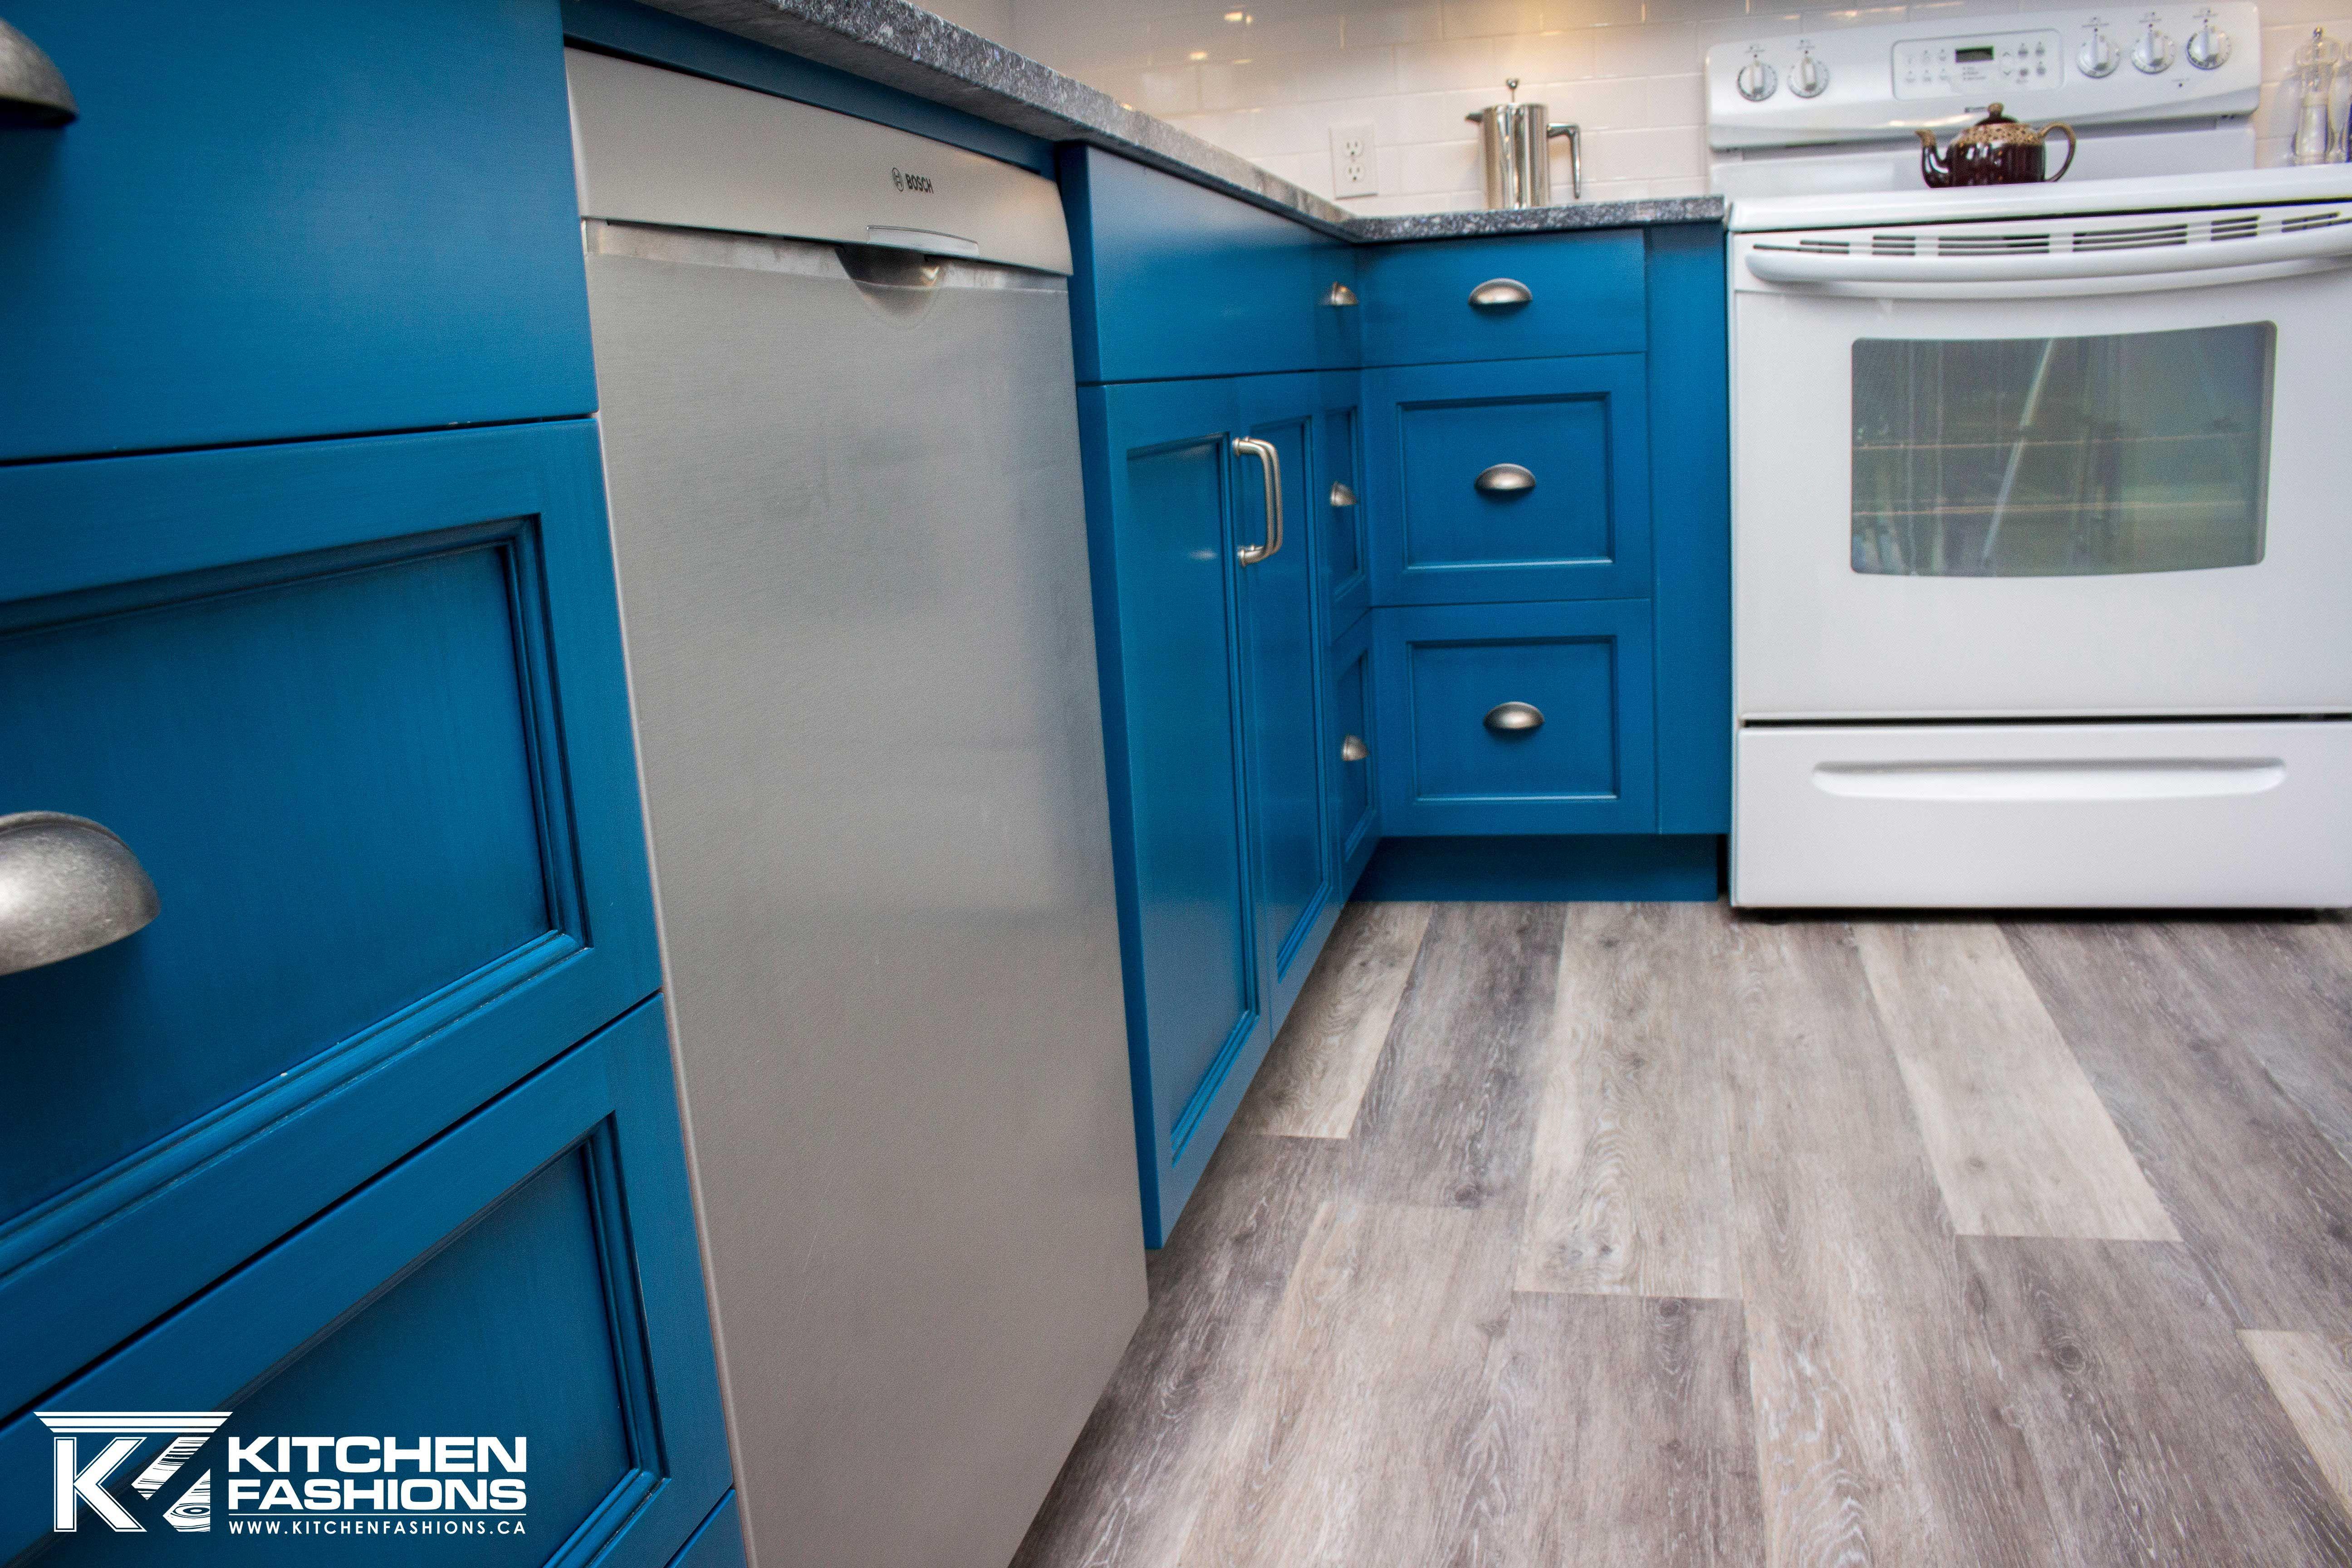 Royal cobalt Tardis Blue Kitchen Cabinets (With images ...